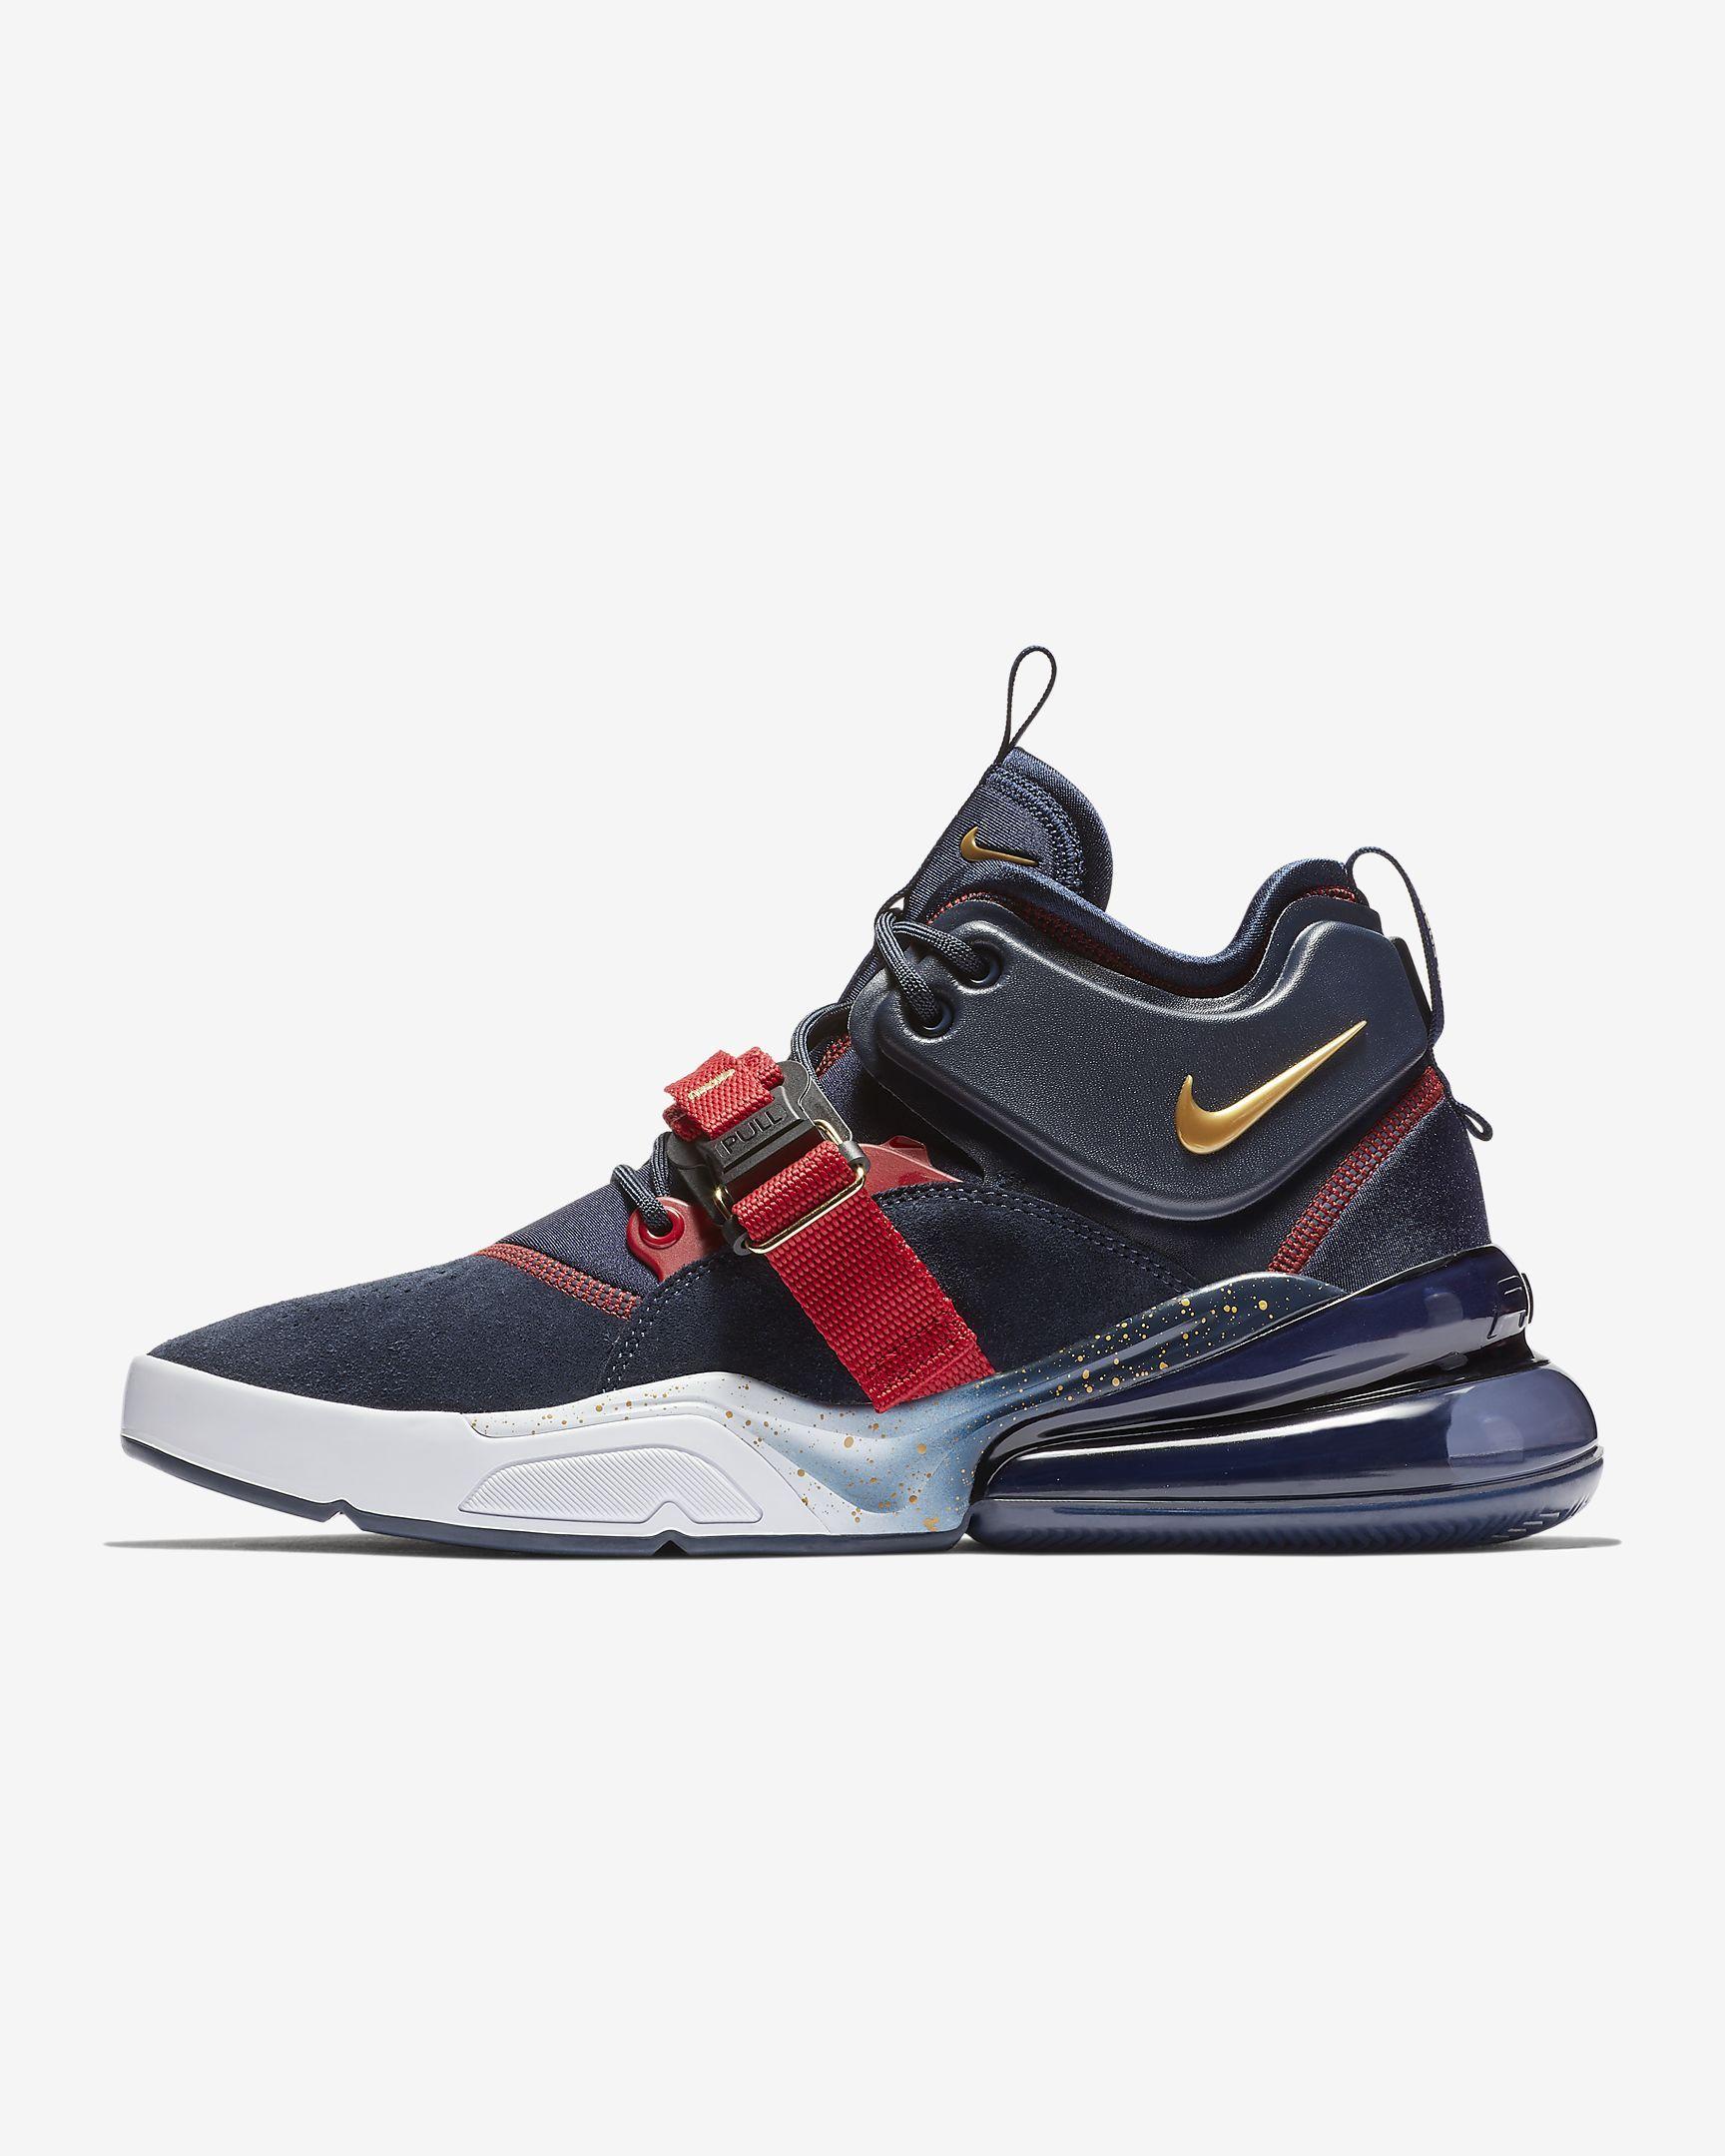 Nike Air Force 270 Men's Shoe | Sneakers men fashion, Mens nike ...